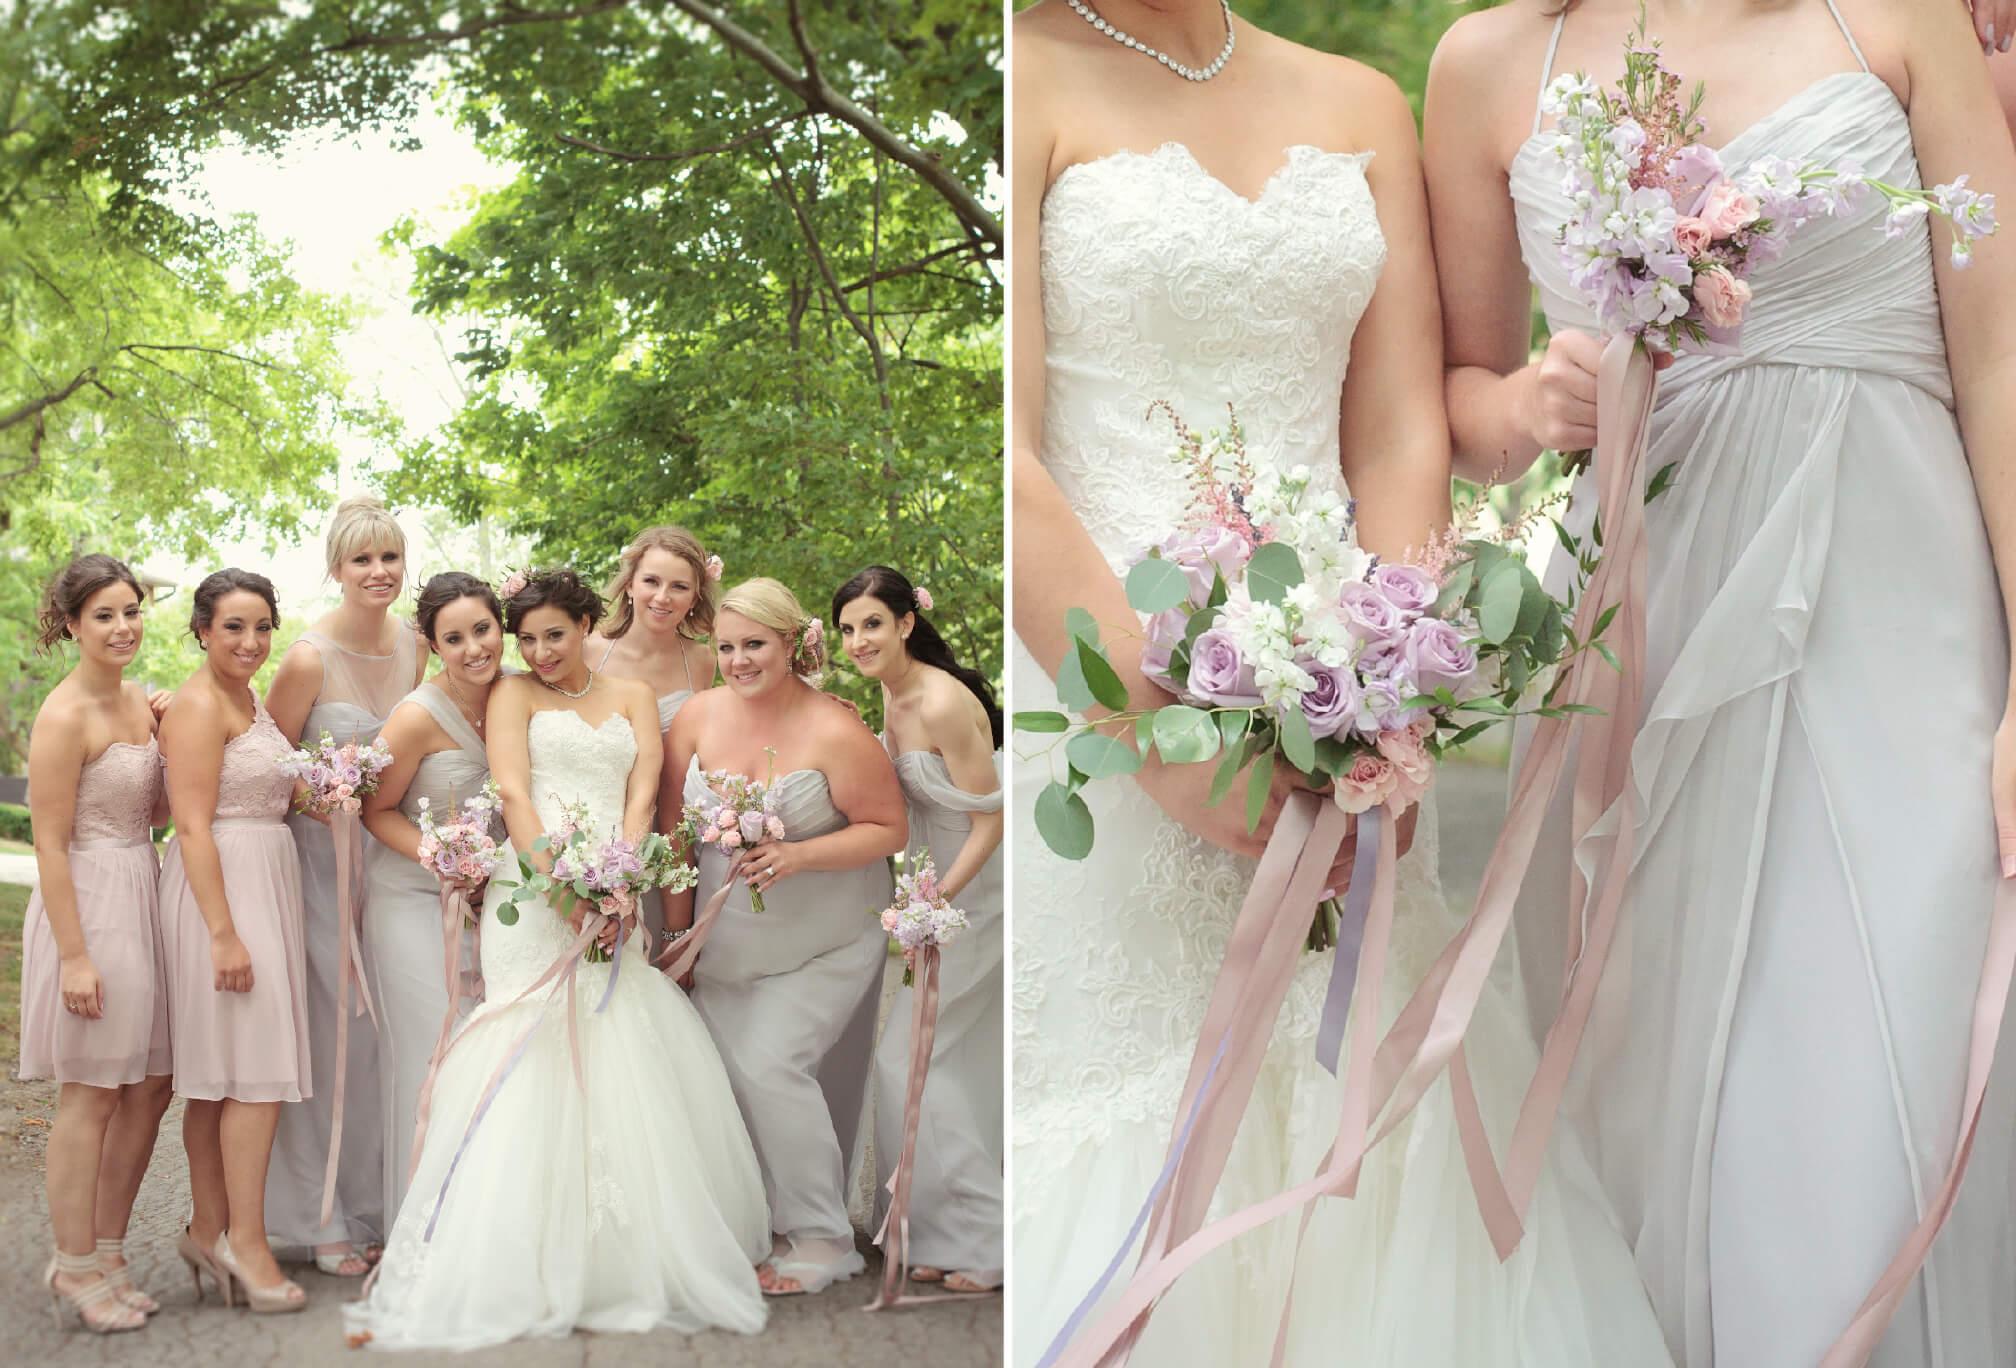 pink and mauve bridesmaids